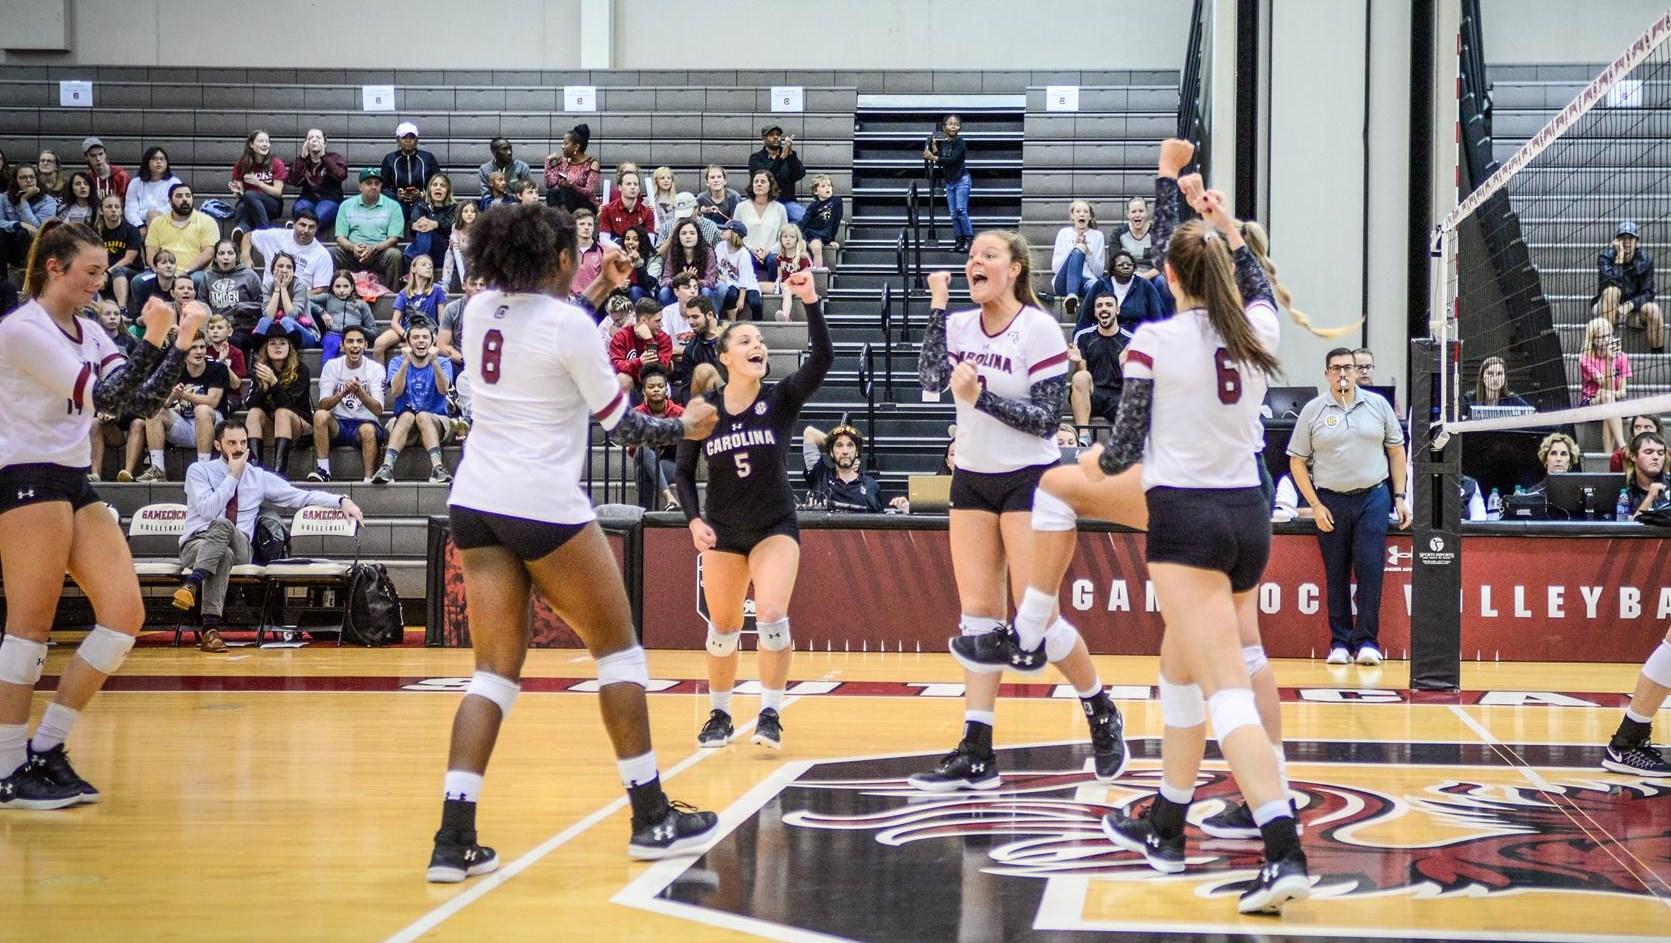 Courtney Furlong Women S Volleyball University Of South Carolina Athletics